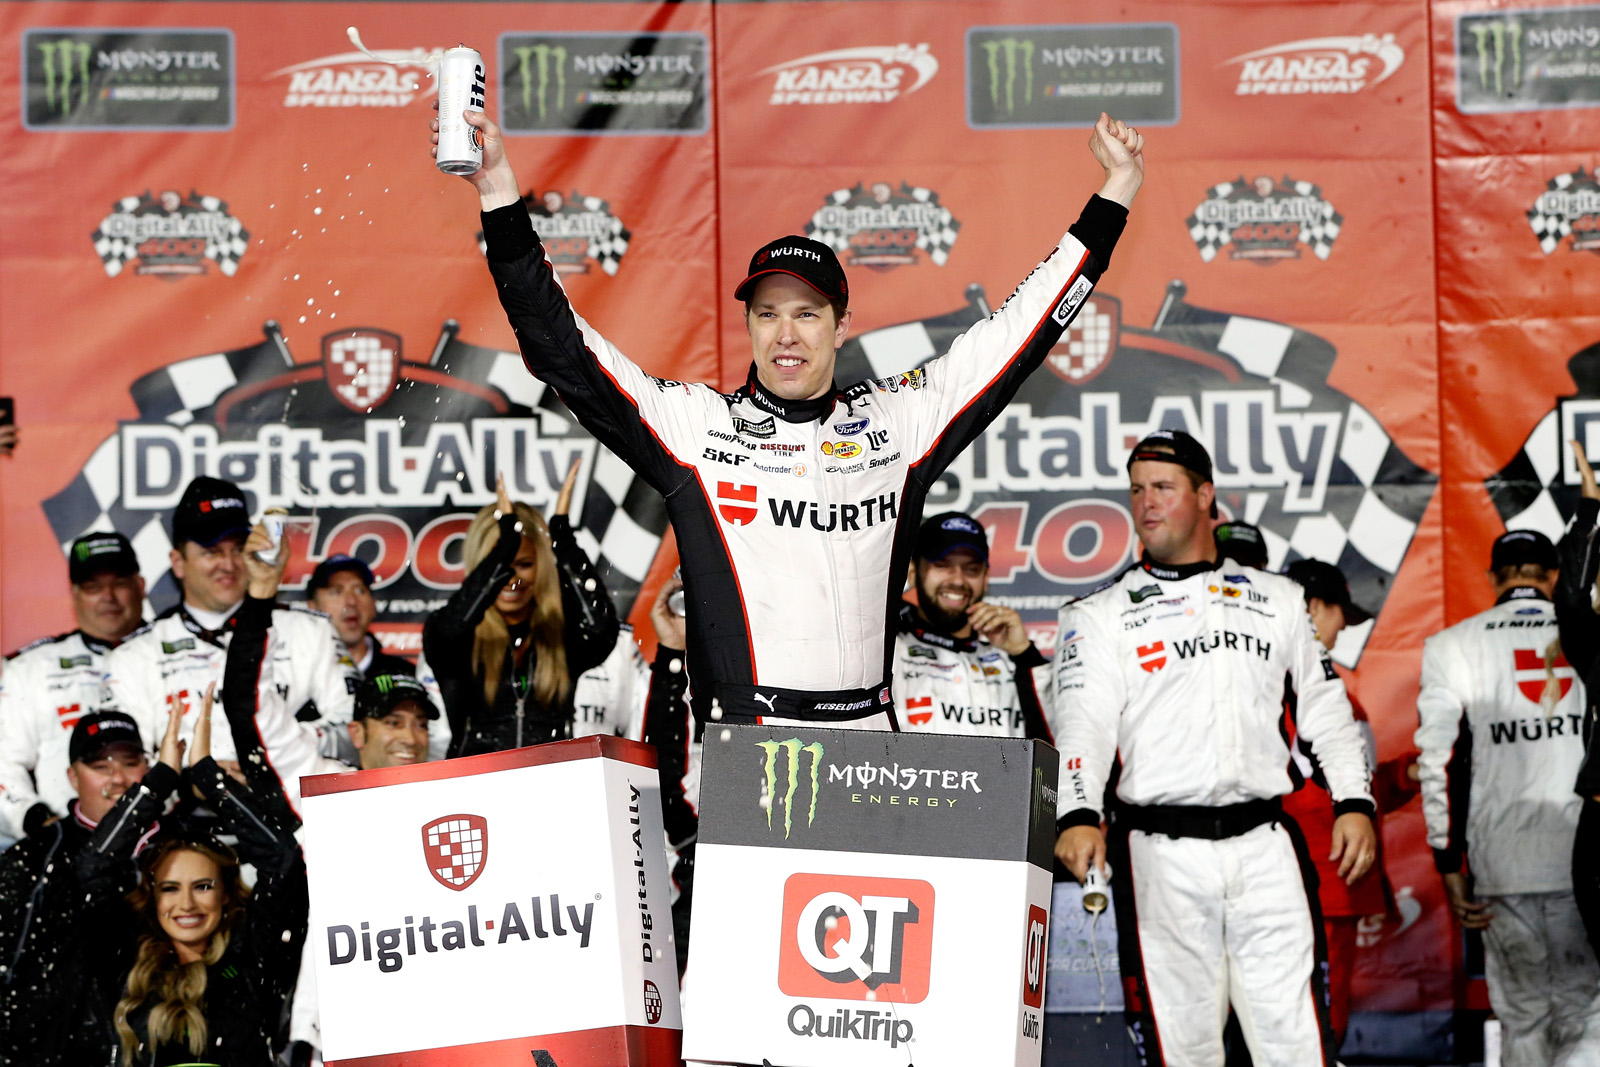 Monster Energy NASCAR Cup Series Race – Digital Ally 400